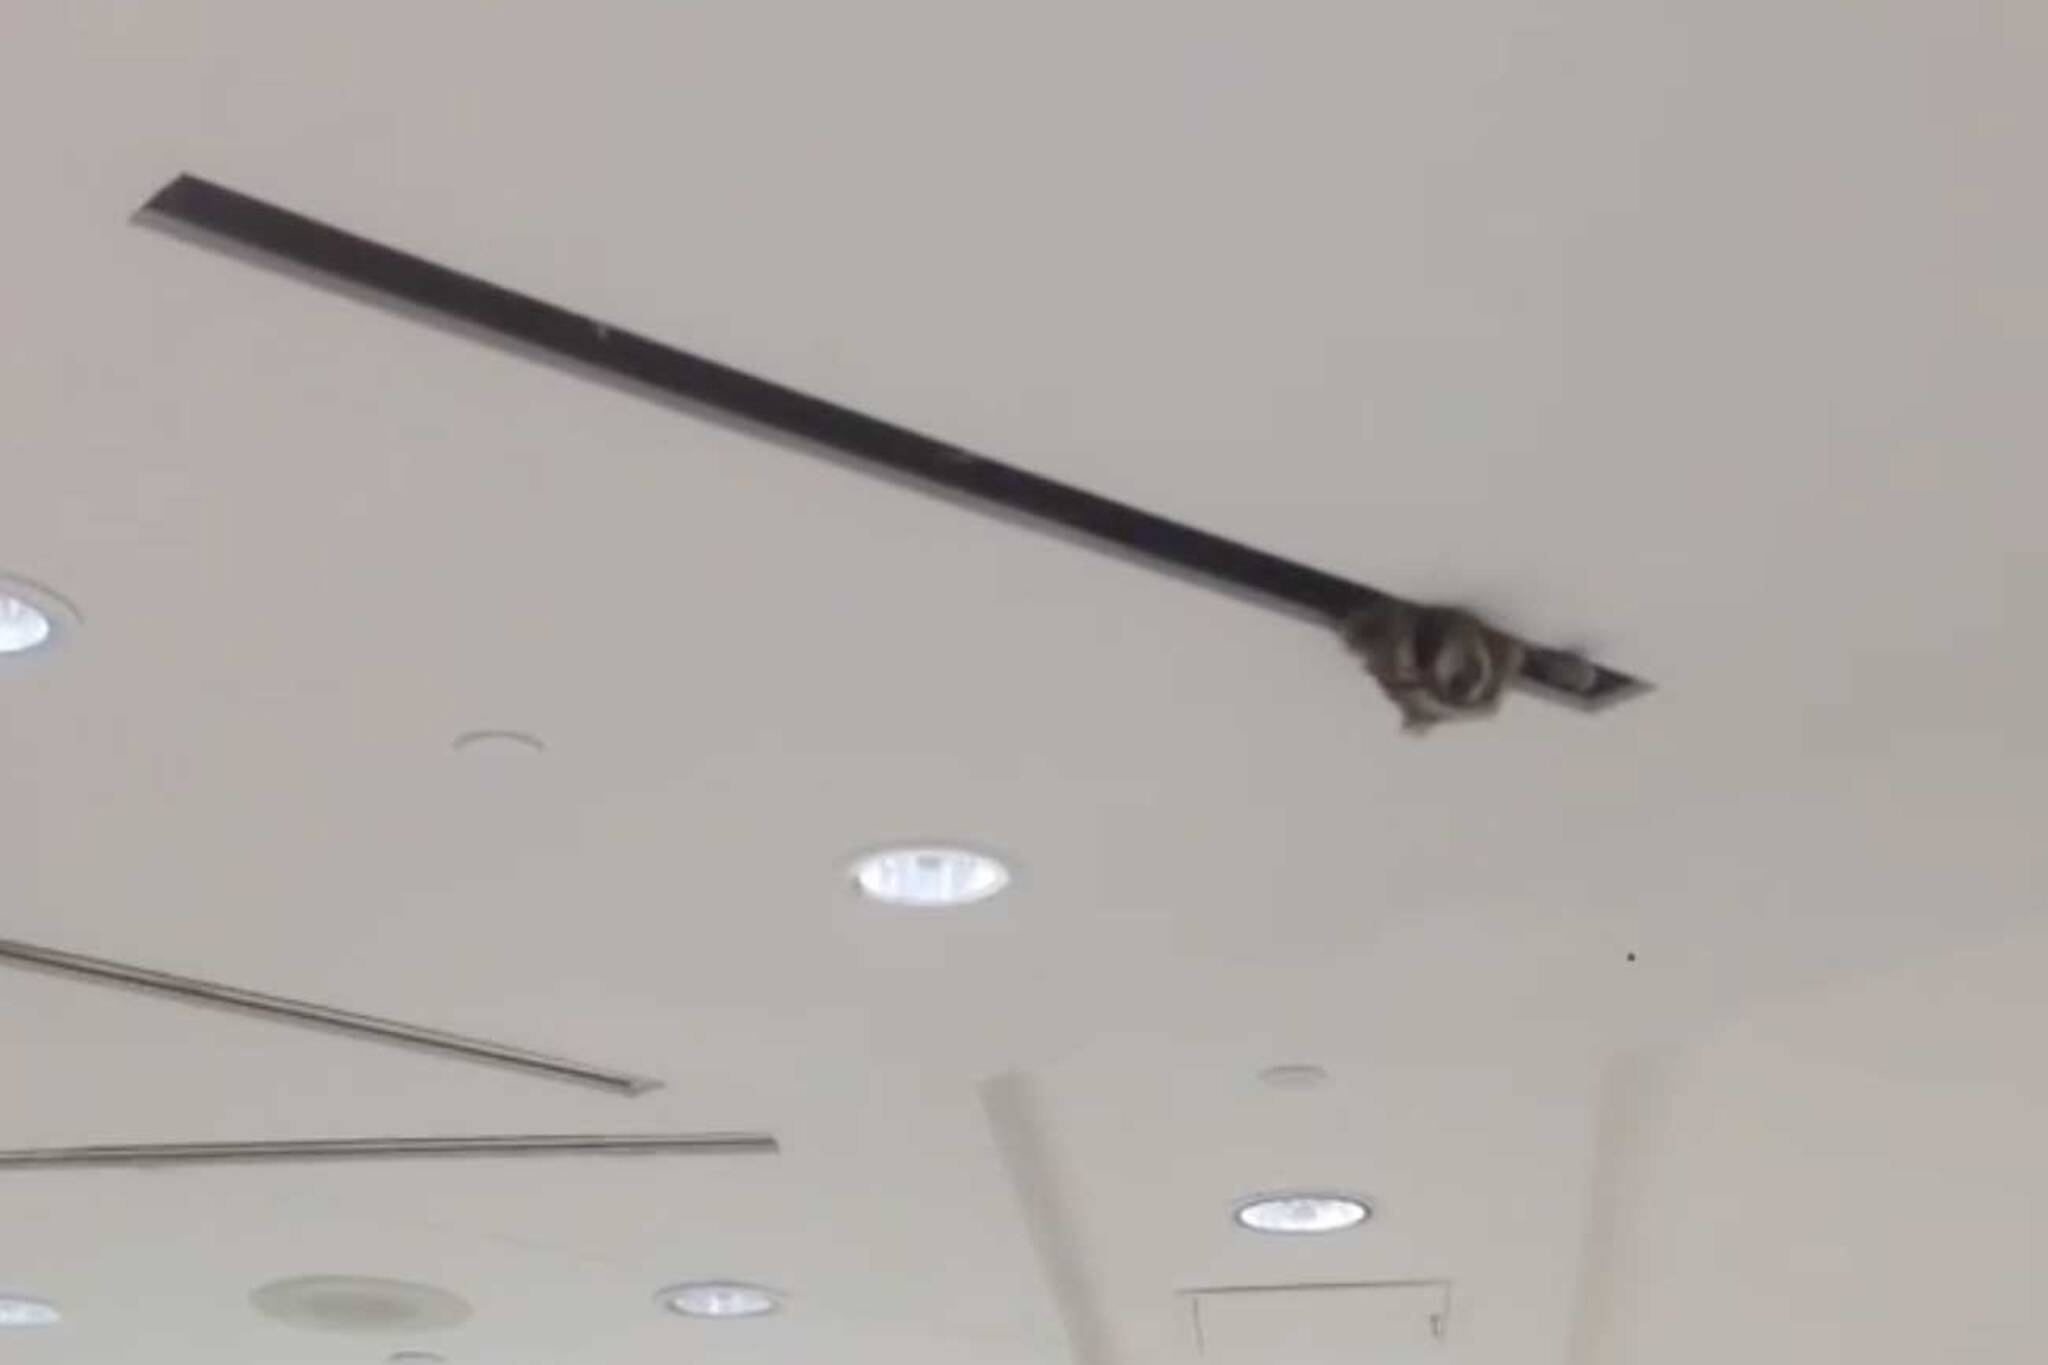 toronto airport raccoon